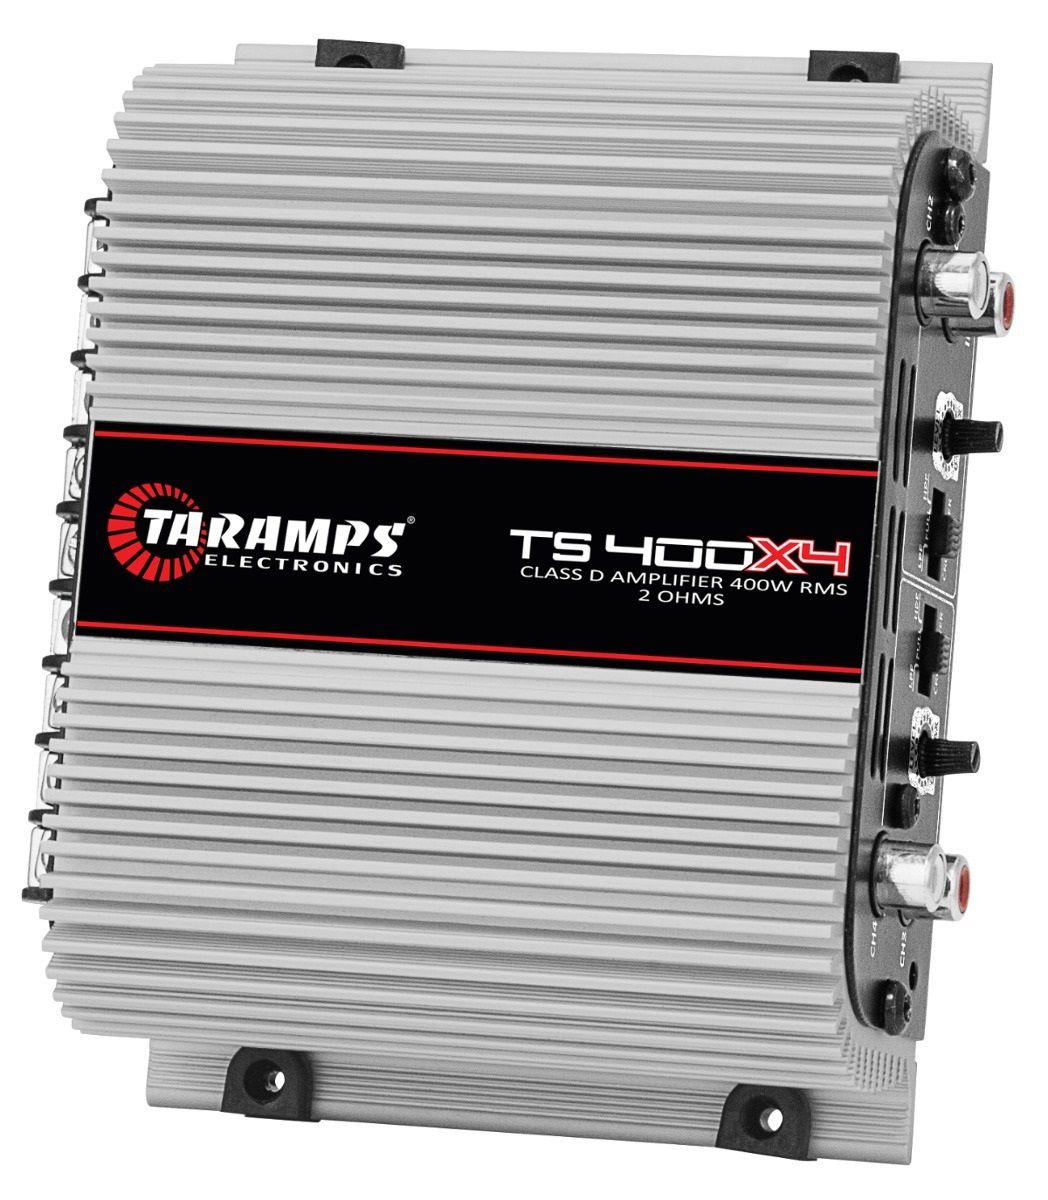 Módulo Amplificador Taramps TS 400x4 400W RMS 4 Canais 2 Ohms